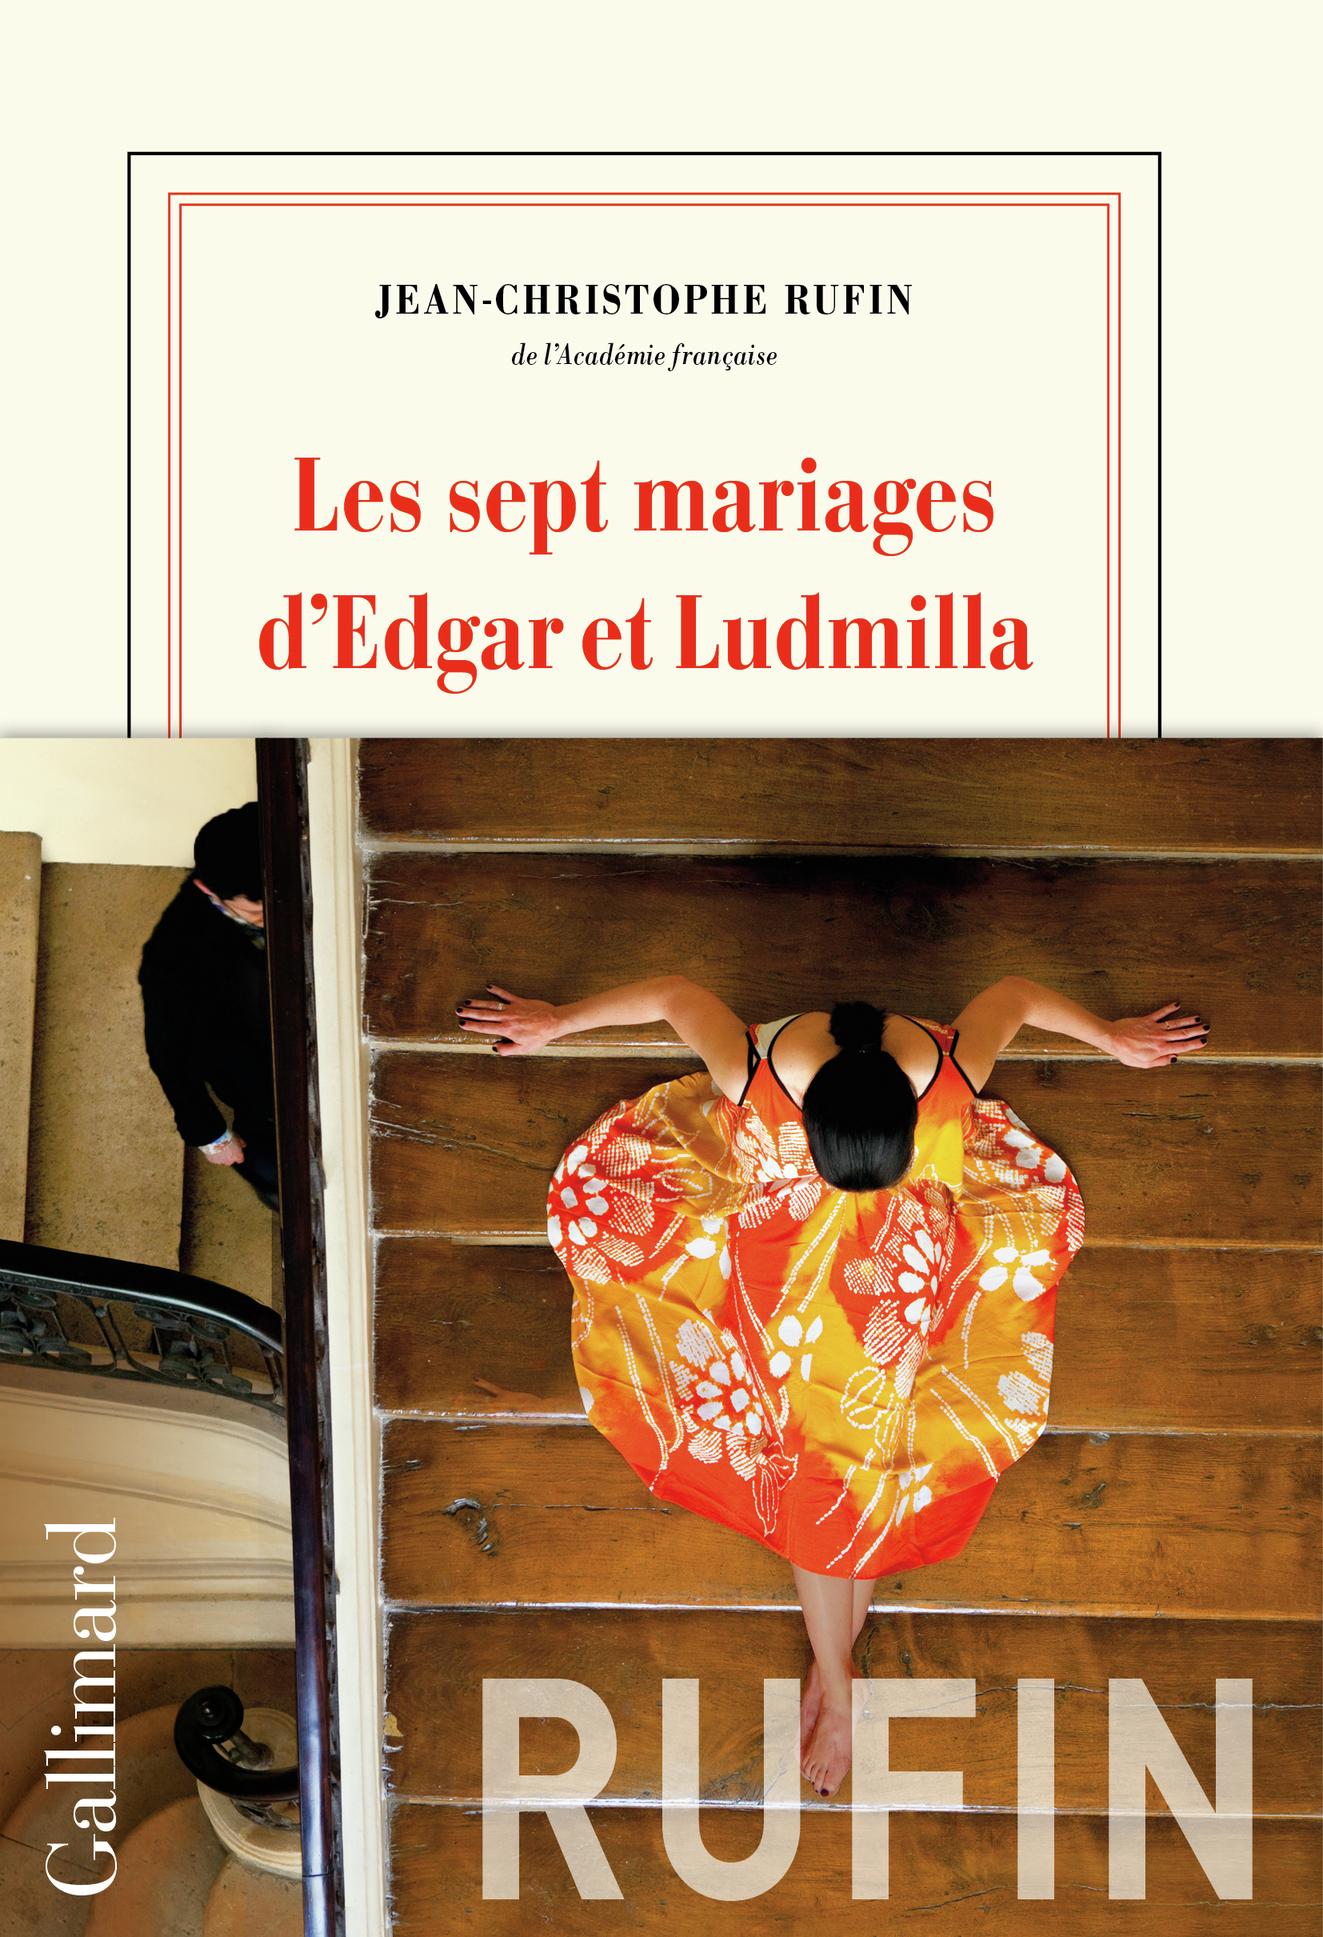 Les sept mariages d'Edgar e...